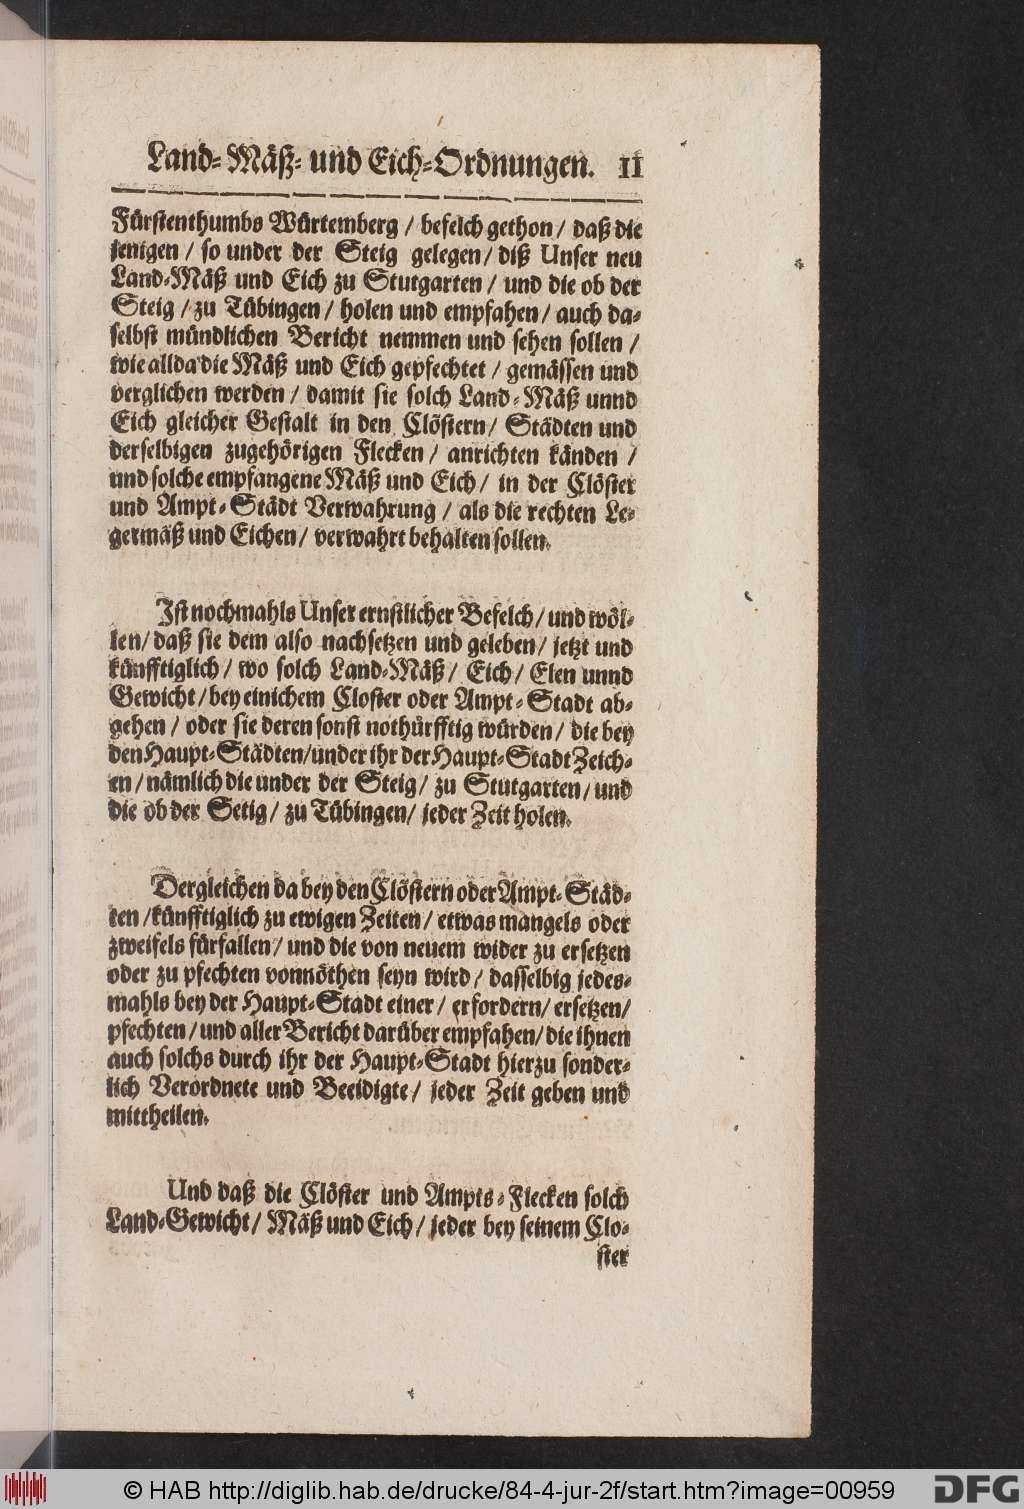 https://diglib.hab.de/drucke/84-4-jur-2f/00959.jpg